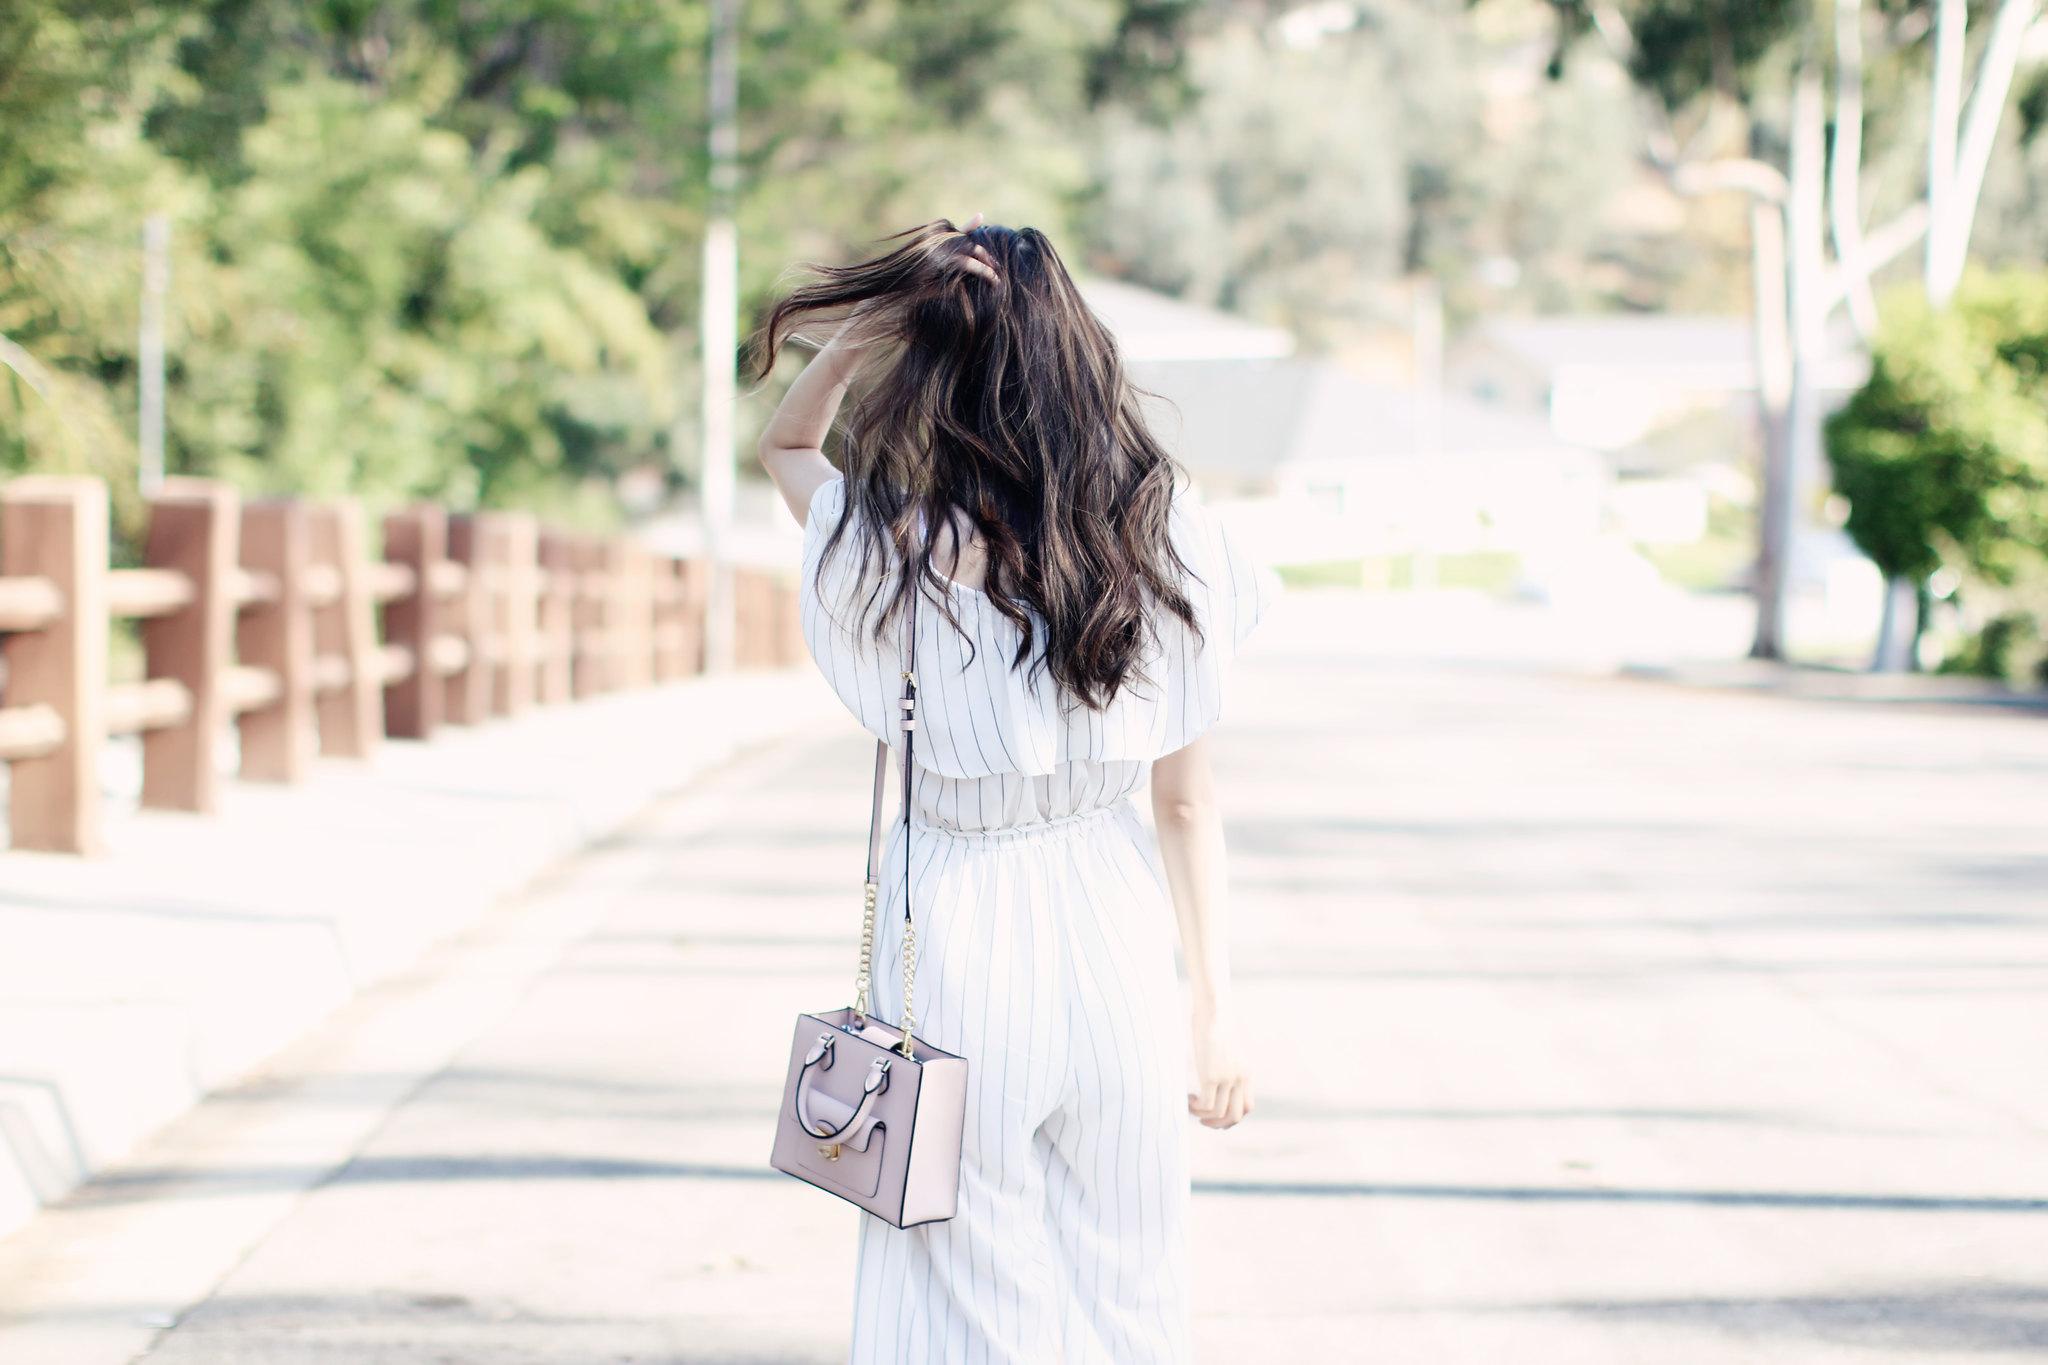 5234-ootd-fashion-style-outfitoftheday-wiwt-streetstyle-owlxfish-f21xme-romper-jumpsuit-bohochic-bershka-zara-summer-elizabeeetht-clothestoyouuu